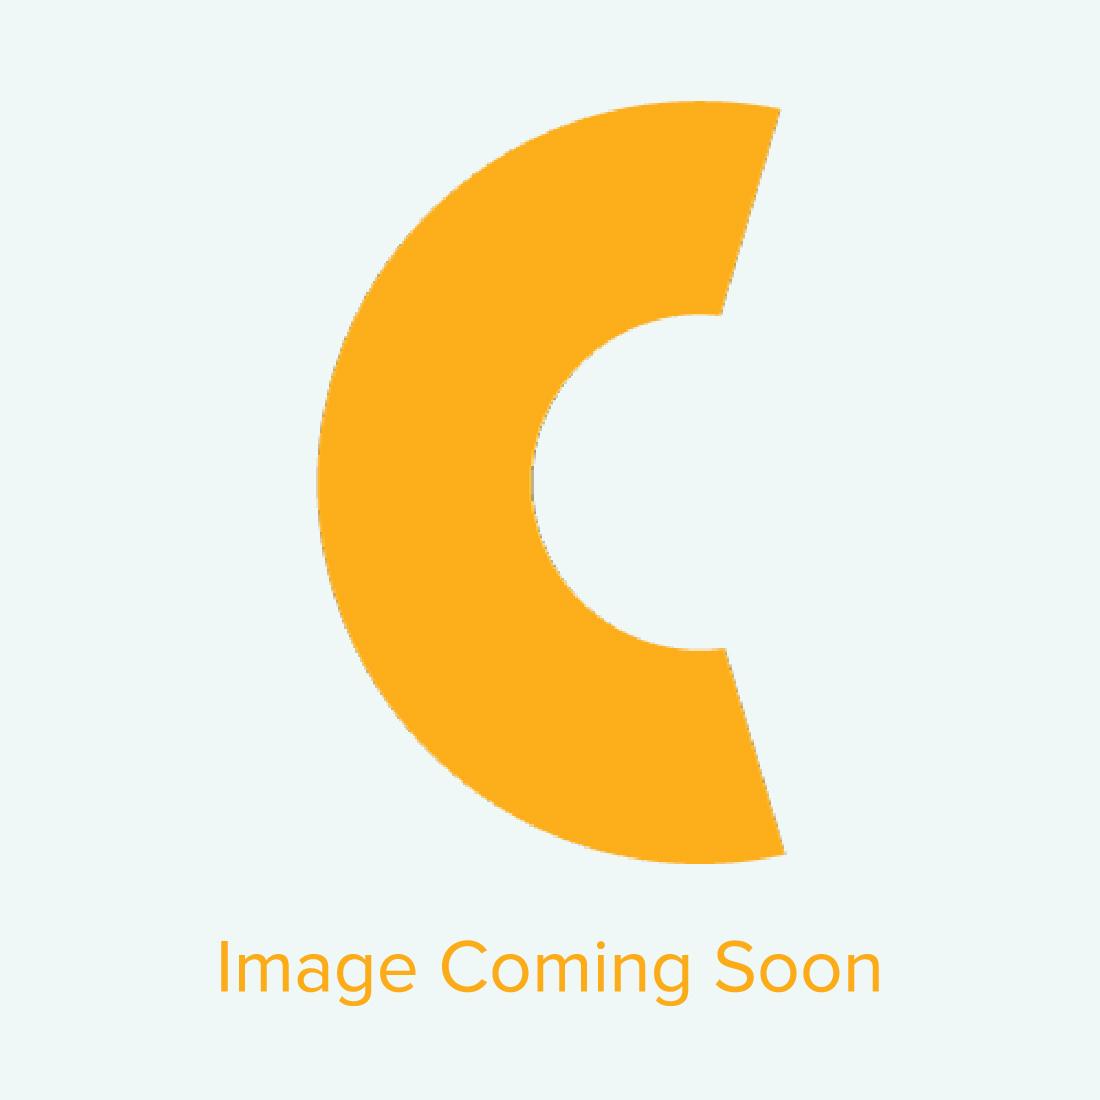 /s/b/sb5595-g_heart-aluminum-sublimation-charm-with-scalloped-edges_1_1.jpg